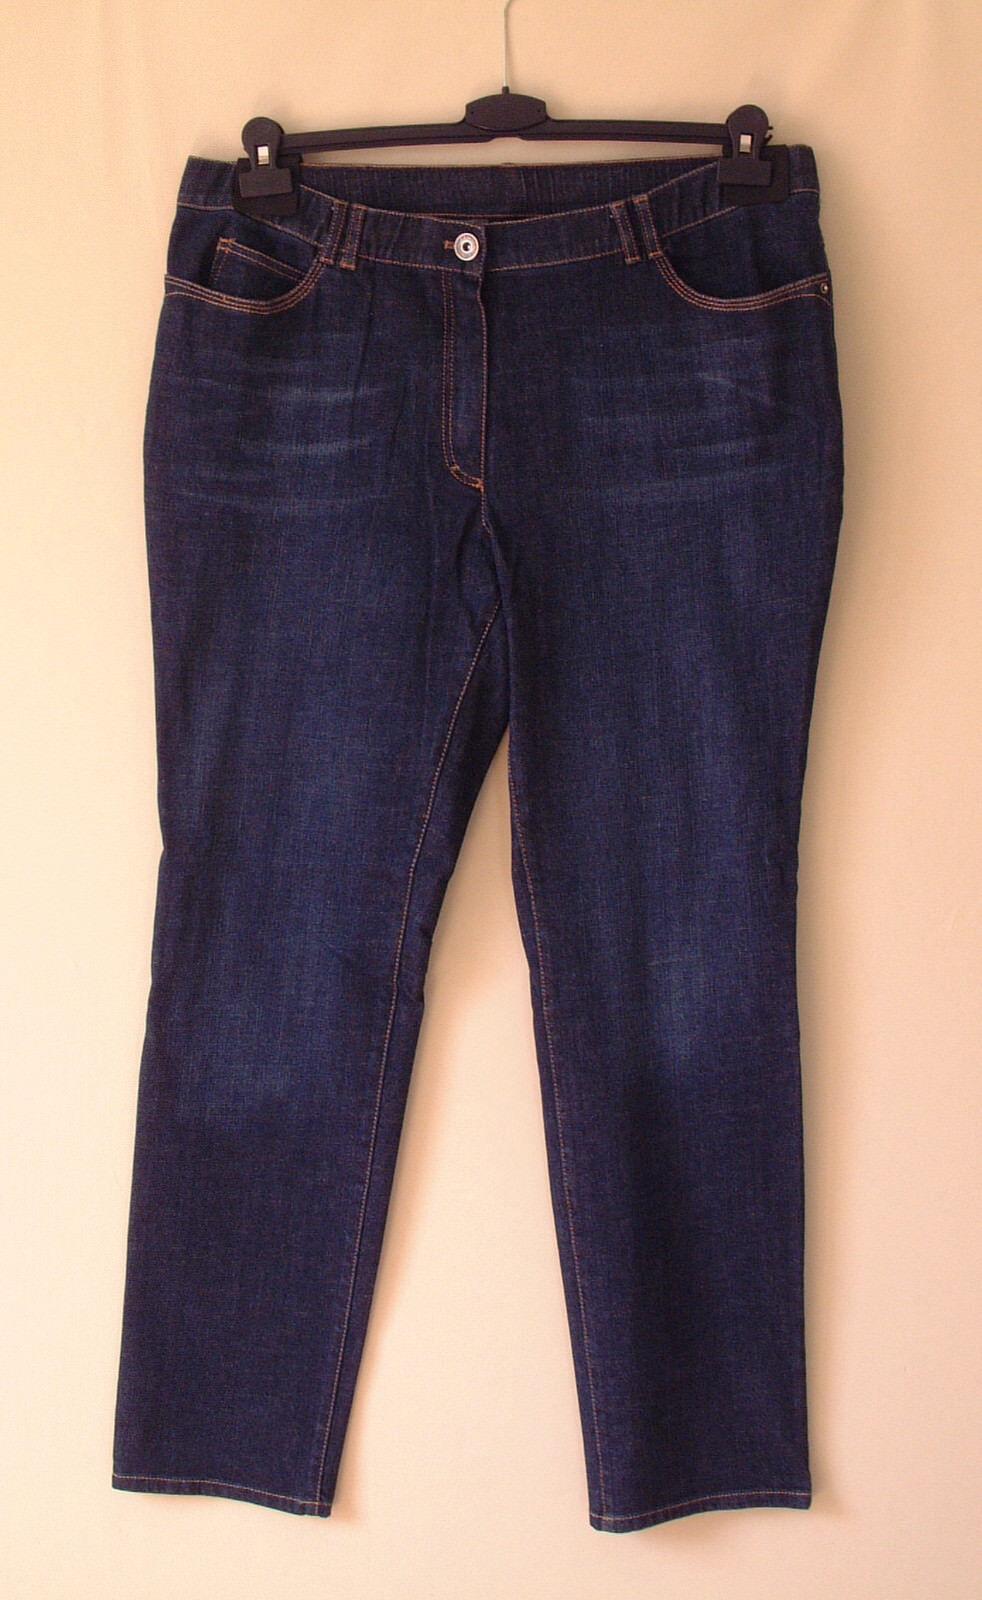 Samoon Jeans by Gerry Weber Hose mit trendigen Wash-Effekten Neu Damen Gr.